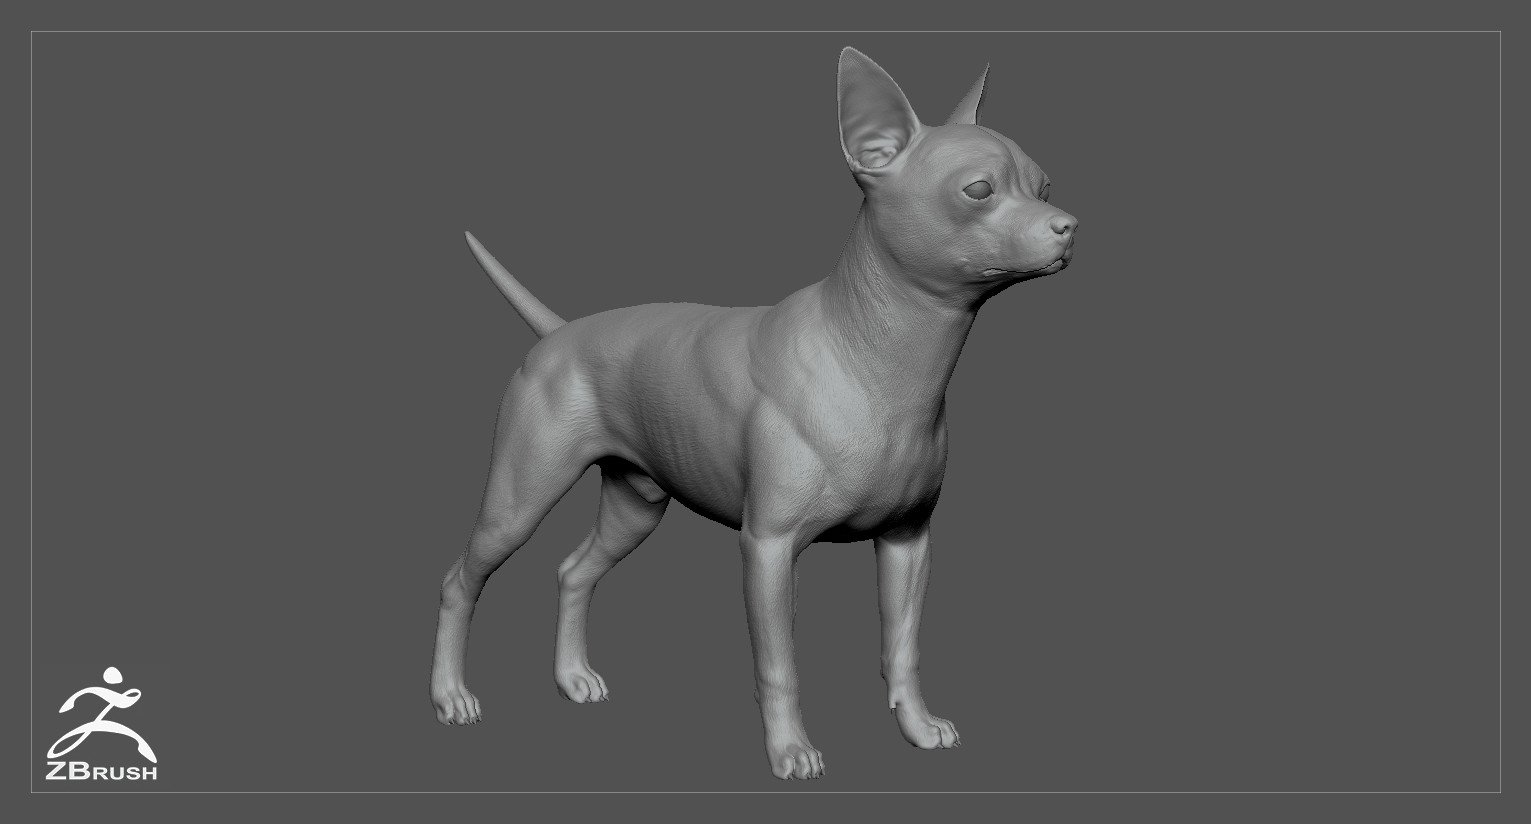 Chihuahua by alexlashko zbrush 01